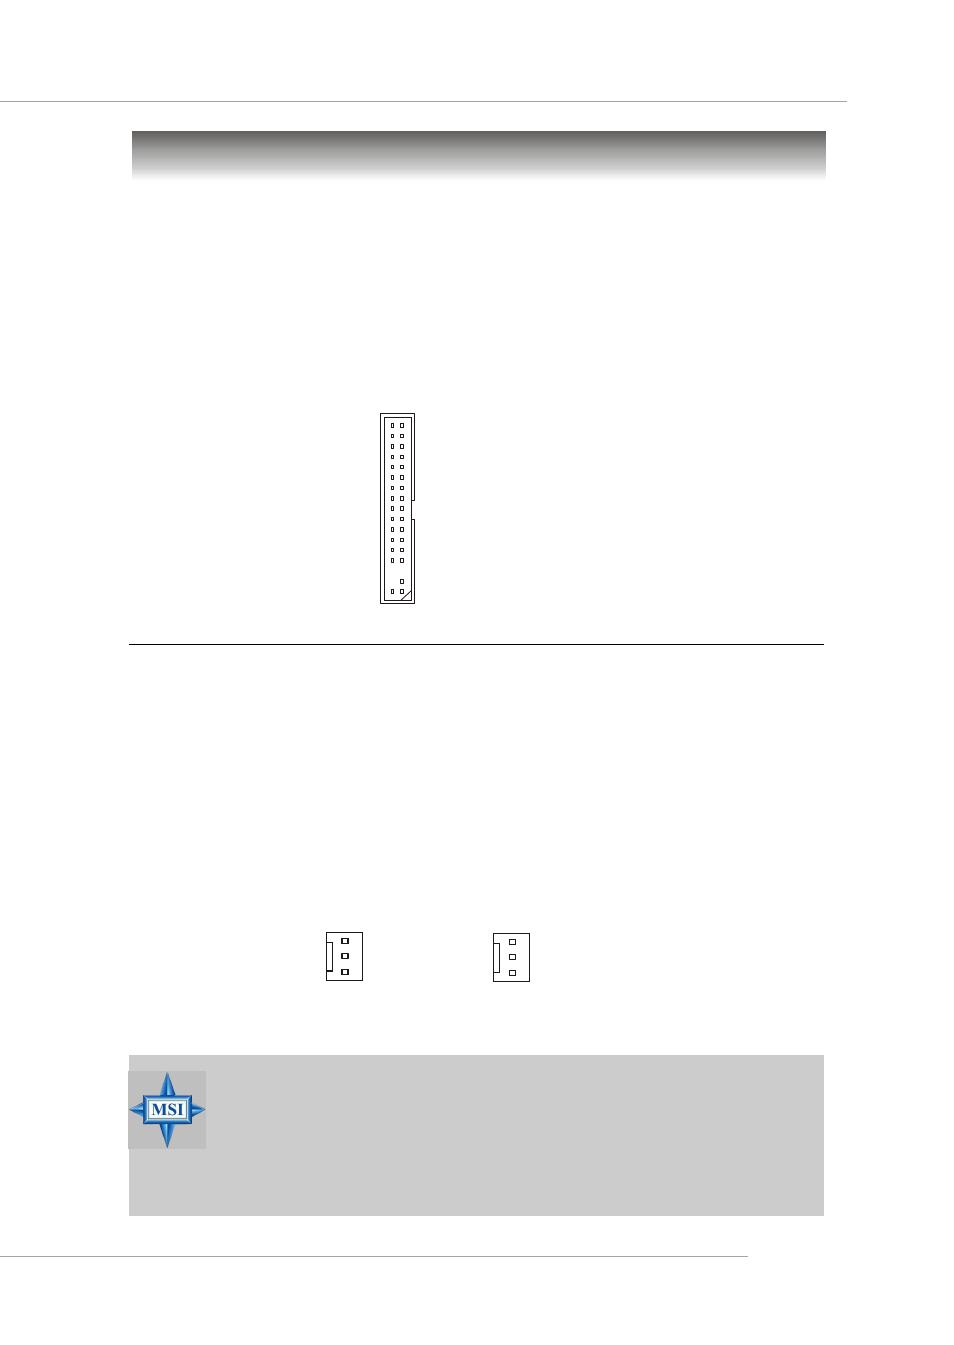 Connectors Floppy Disk Drive Connector Fdd1 Fan Power Electric Wiringwiringfan2speedpng Cpufa1 Sysfa1 Intel Km4am User Manual Page 25 74